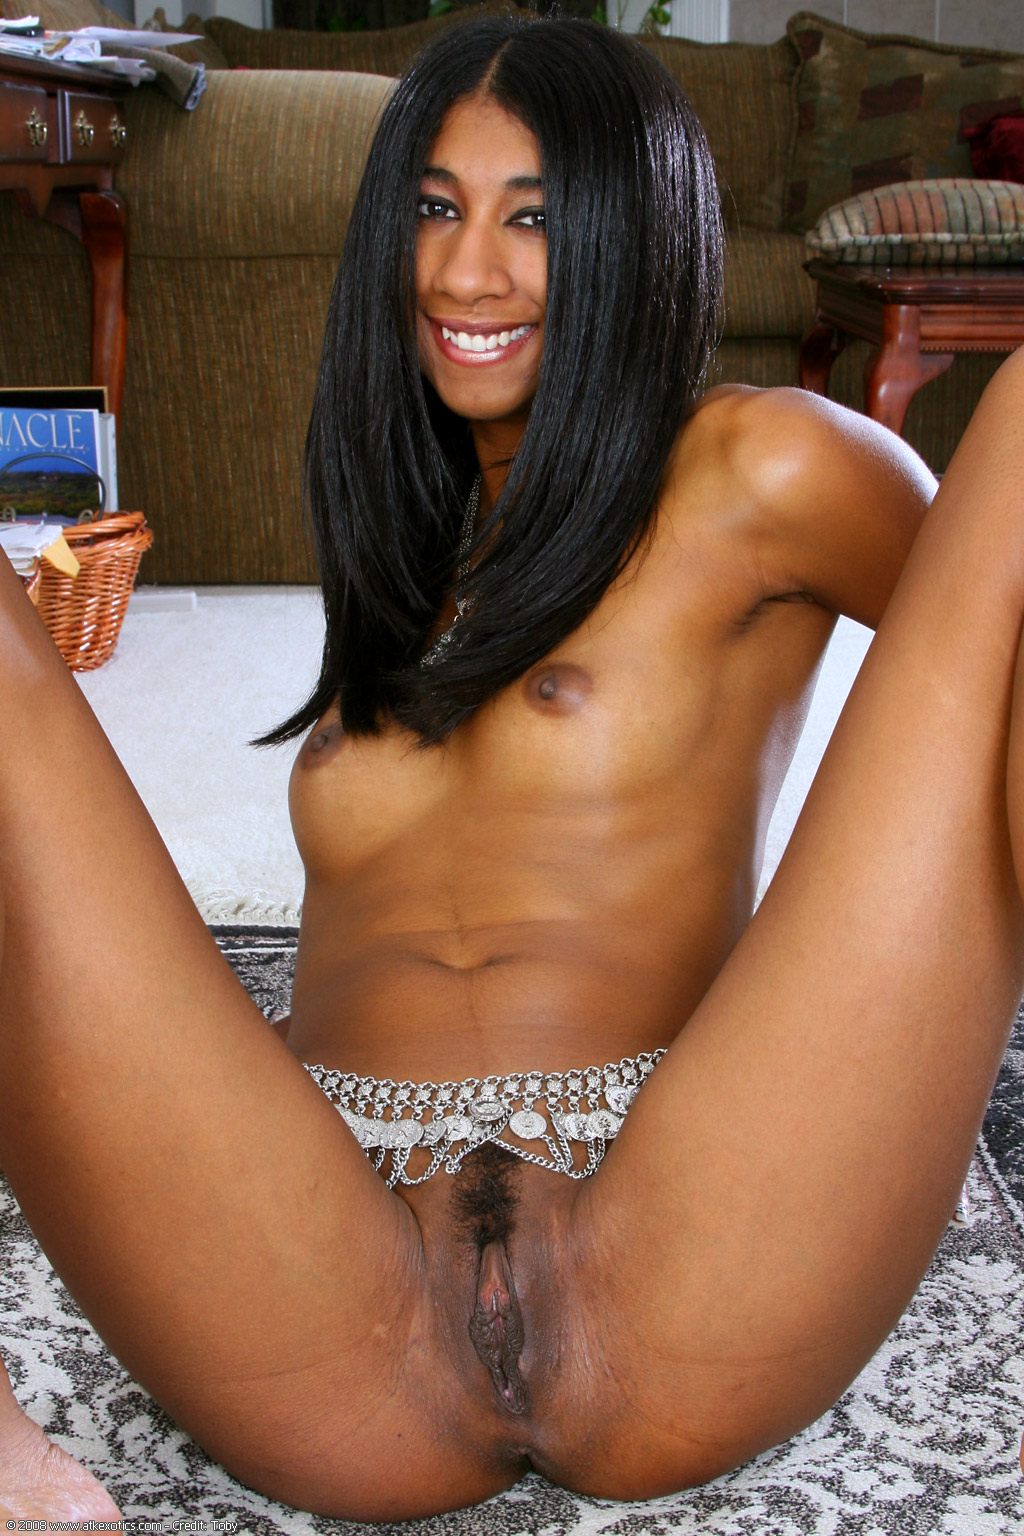 atk ebony women inside mature sex black milf atk ebony beauty